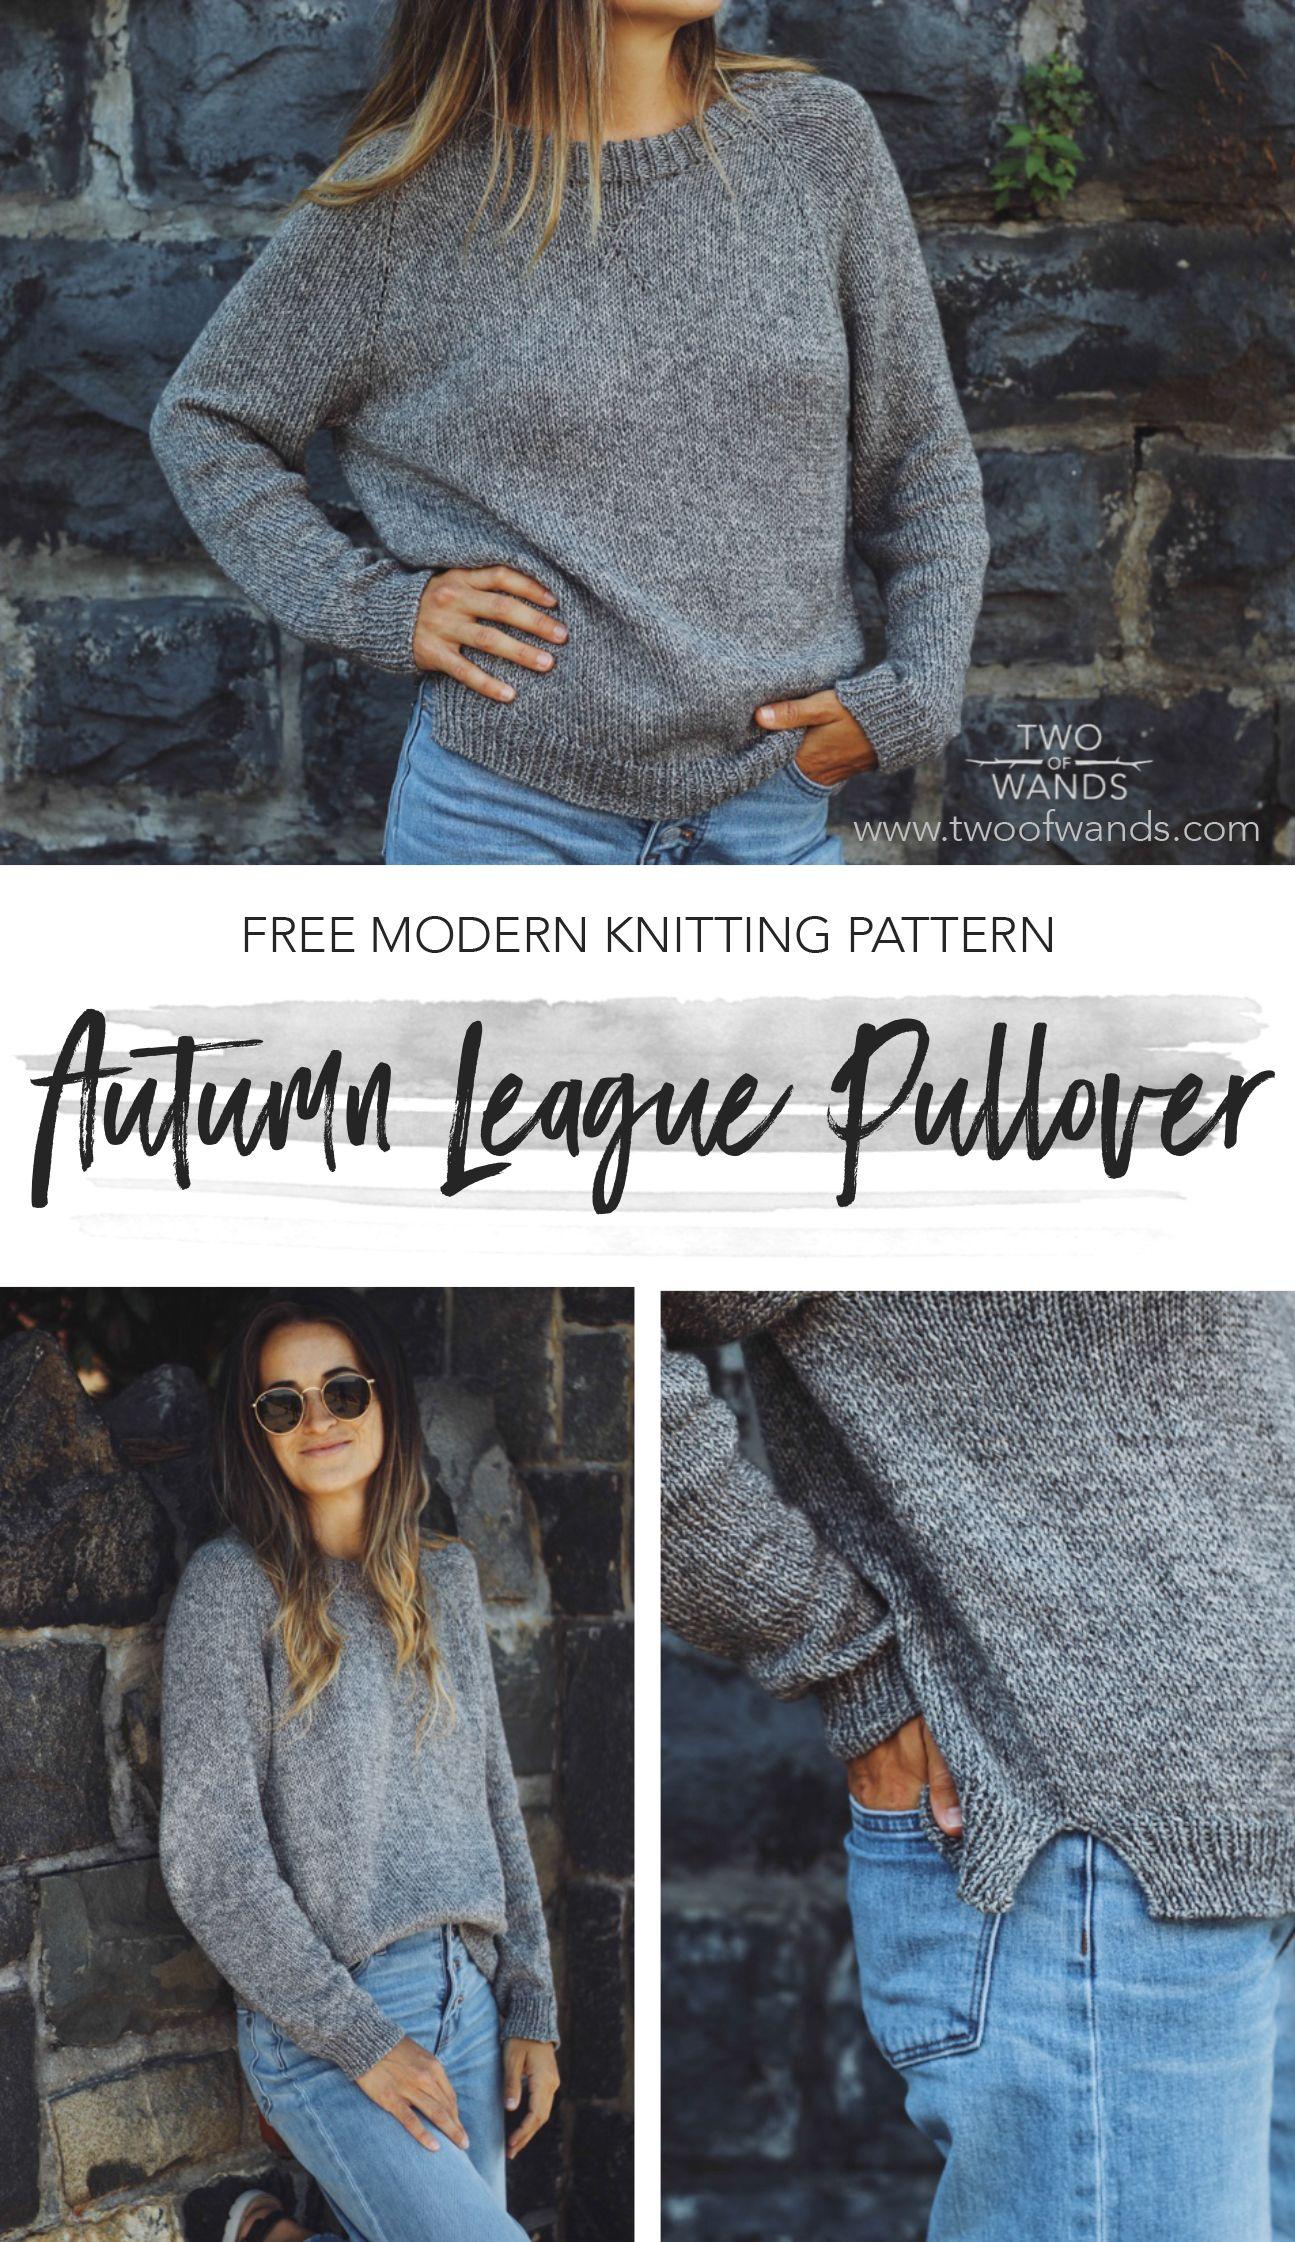 Photo of Autumn League Pullover